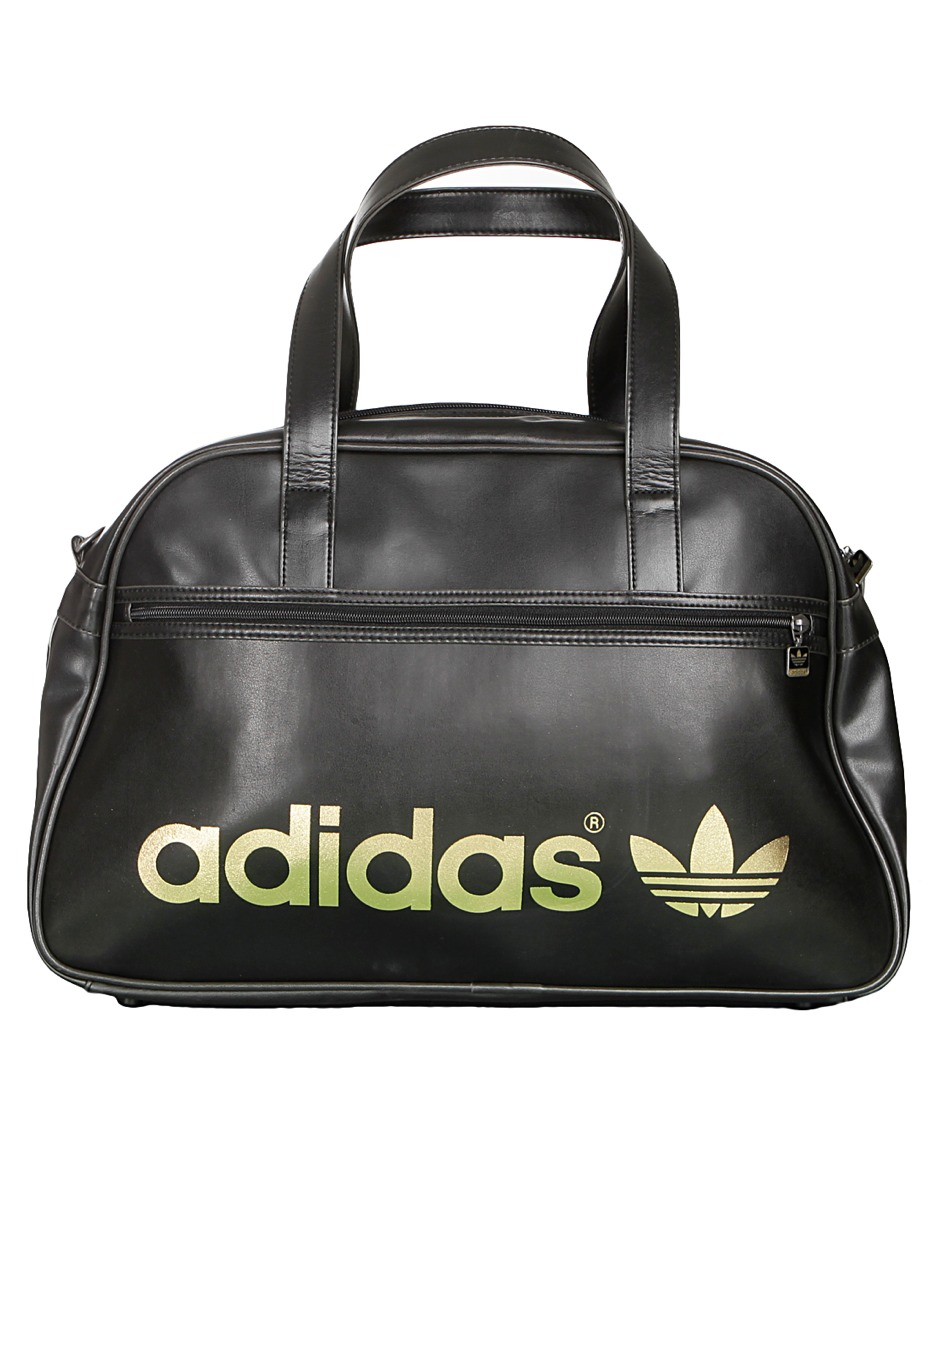 74c88d5b54e Adidas - AC Holdall Black/Metallic Gold - Bag - Streetwear Shop -  Impericon.com Worldwide